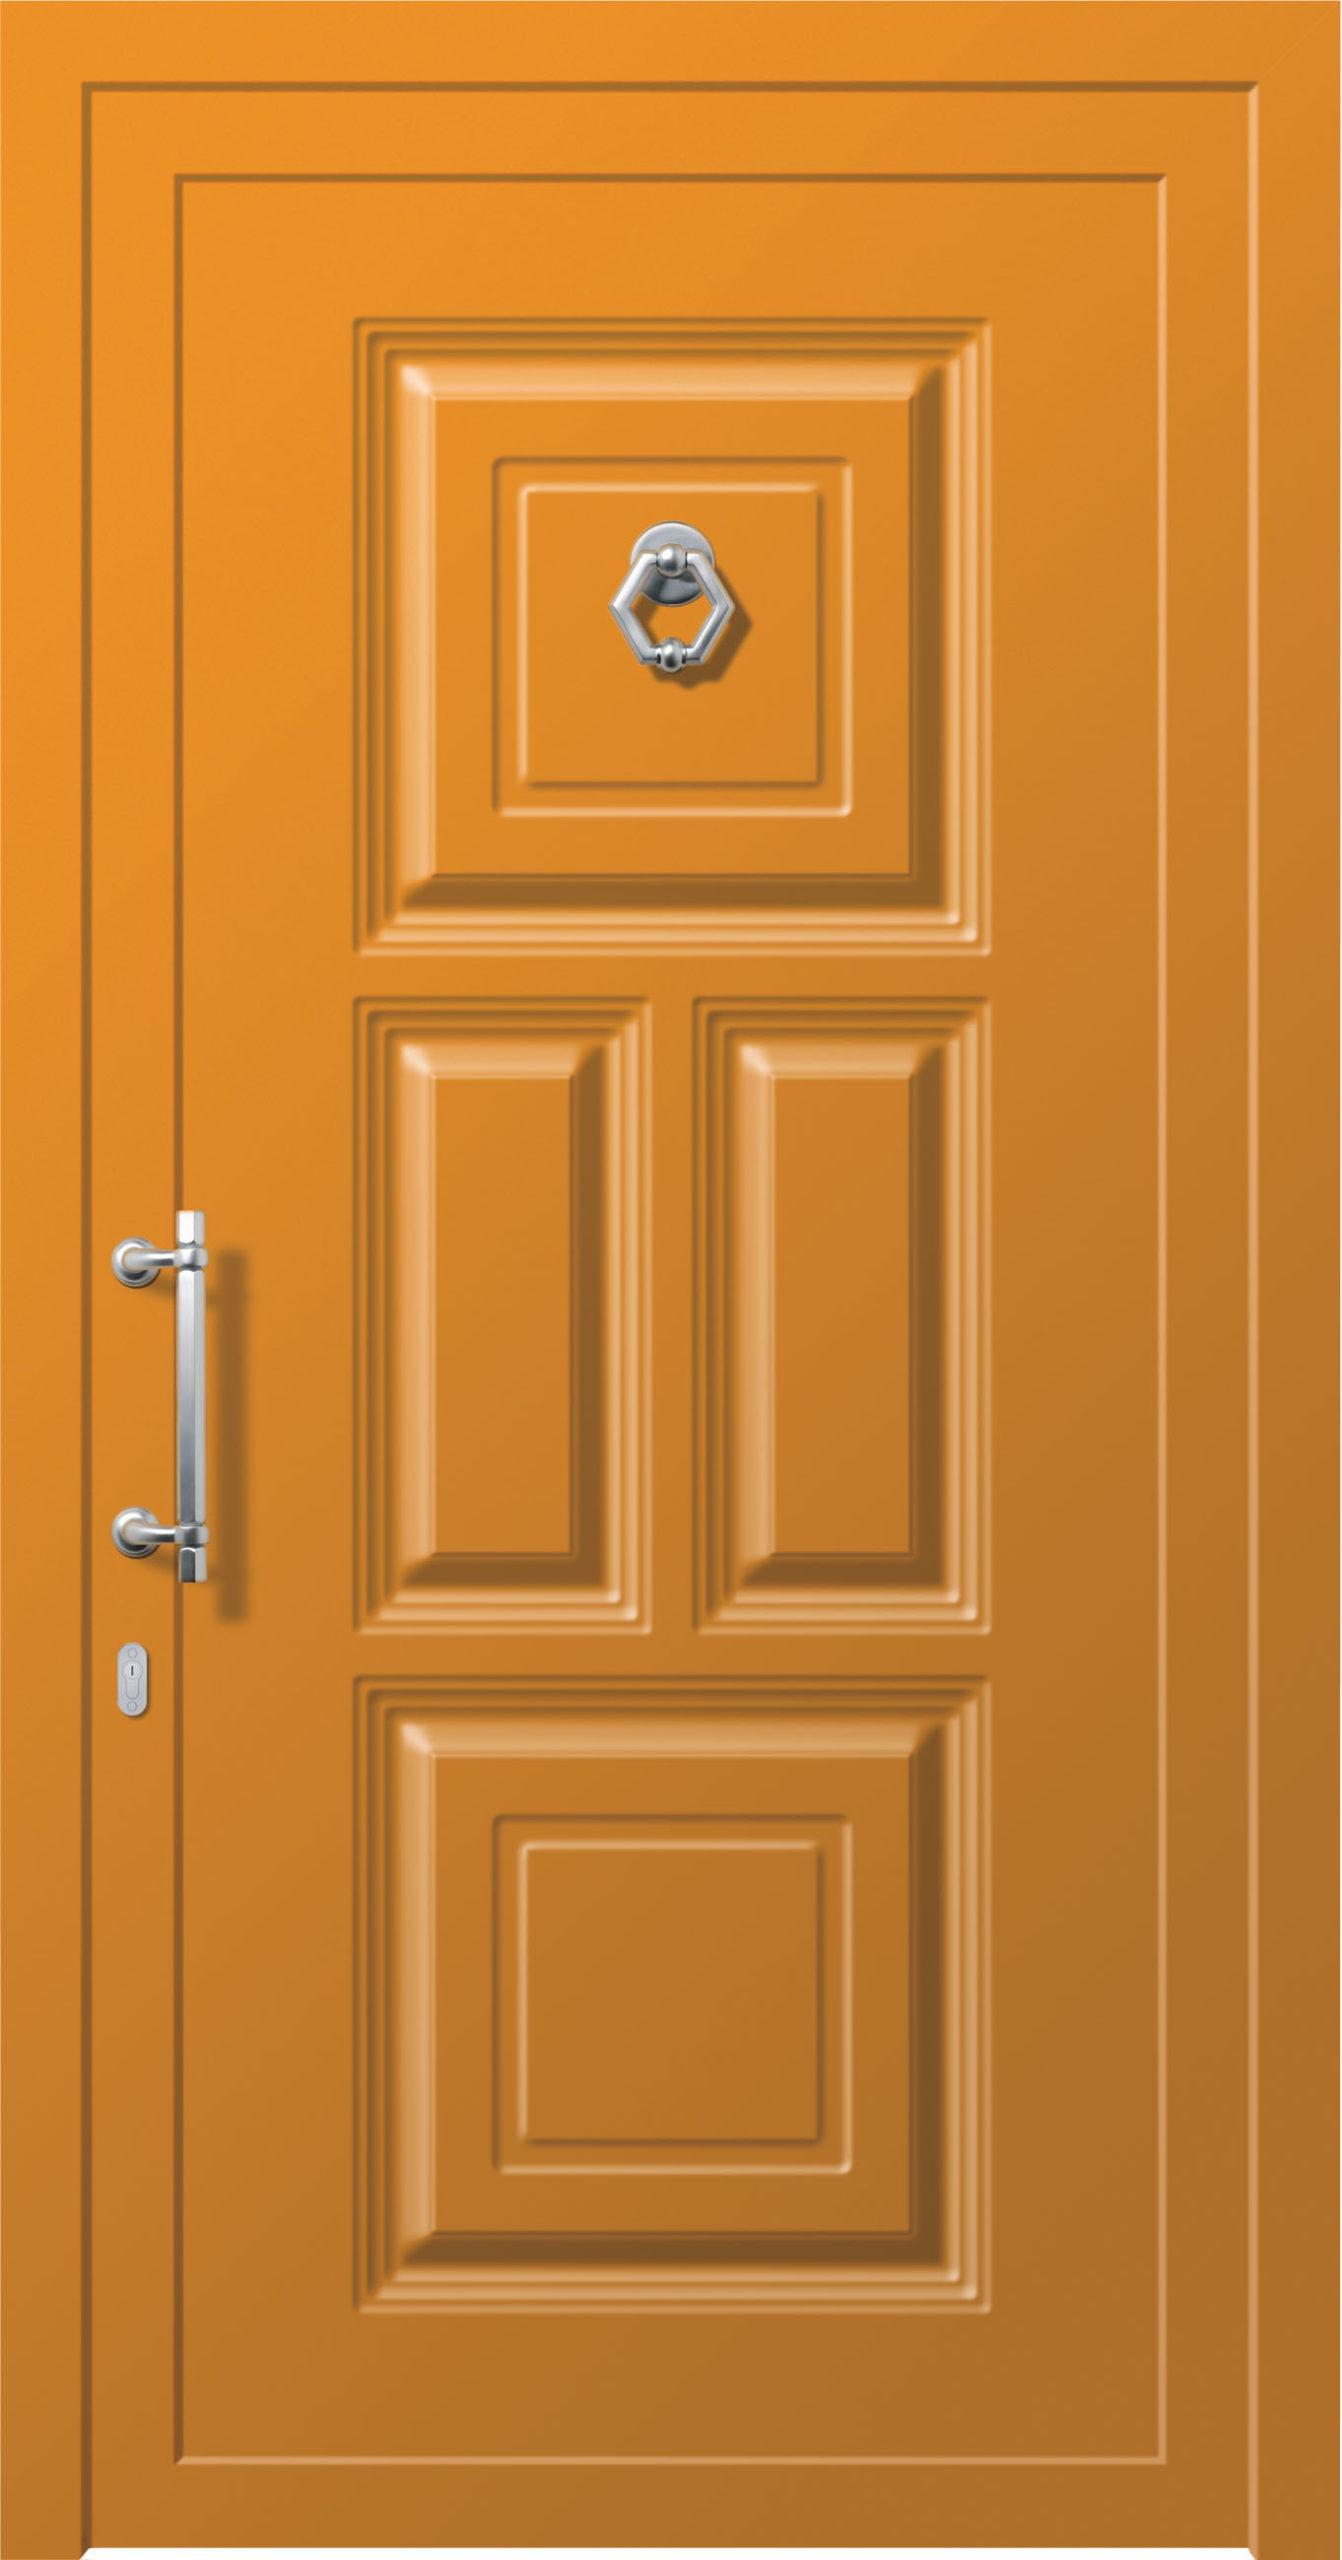 Entry Doors Linea Classica 124